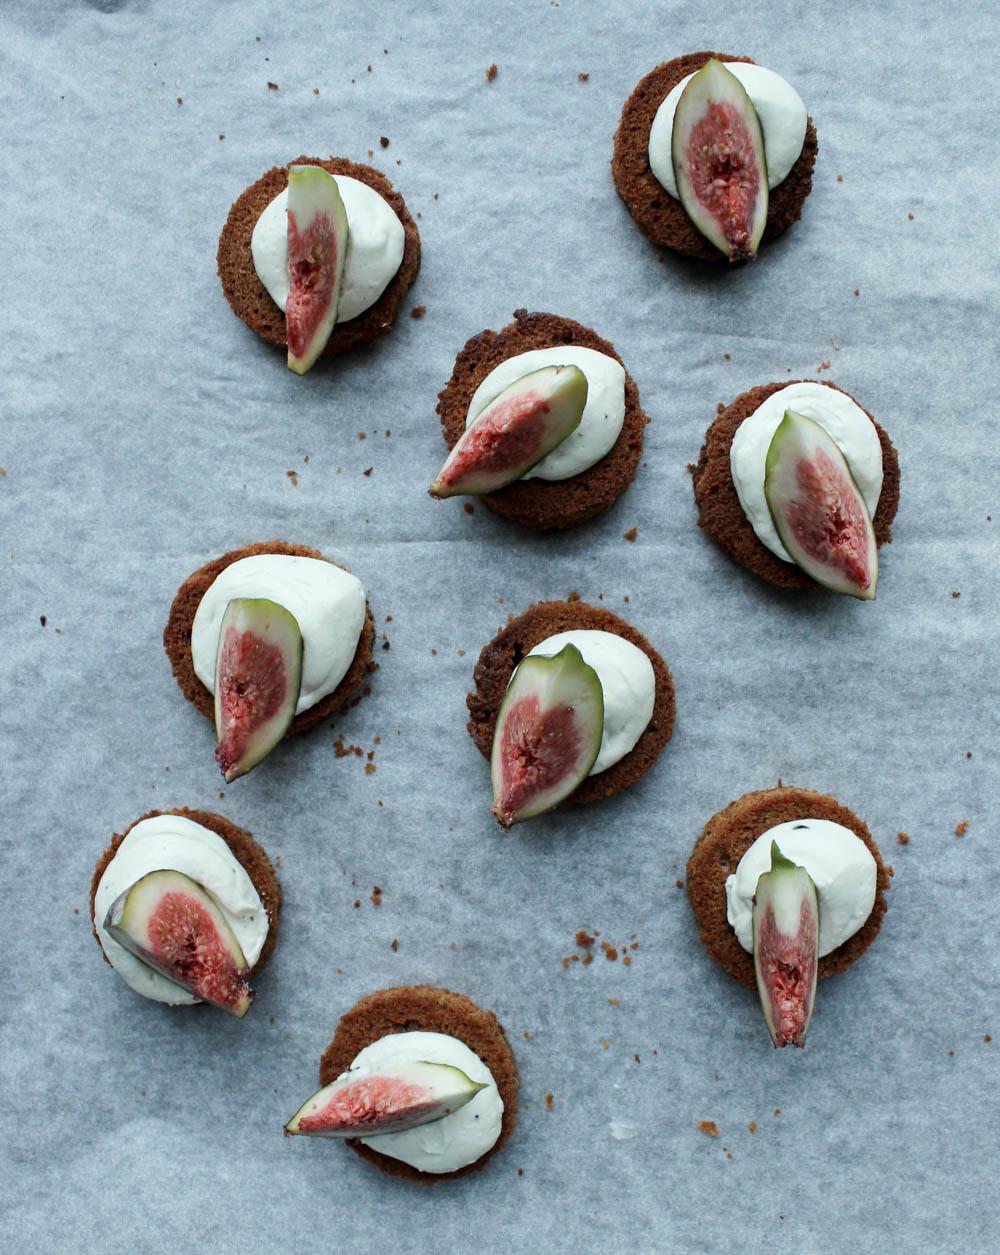 pepparkaka adelost adventsmingel gloggfest fikon (3)